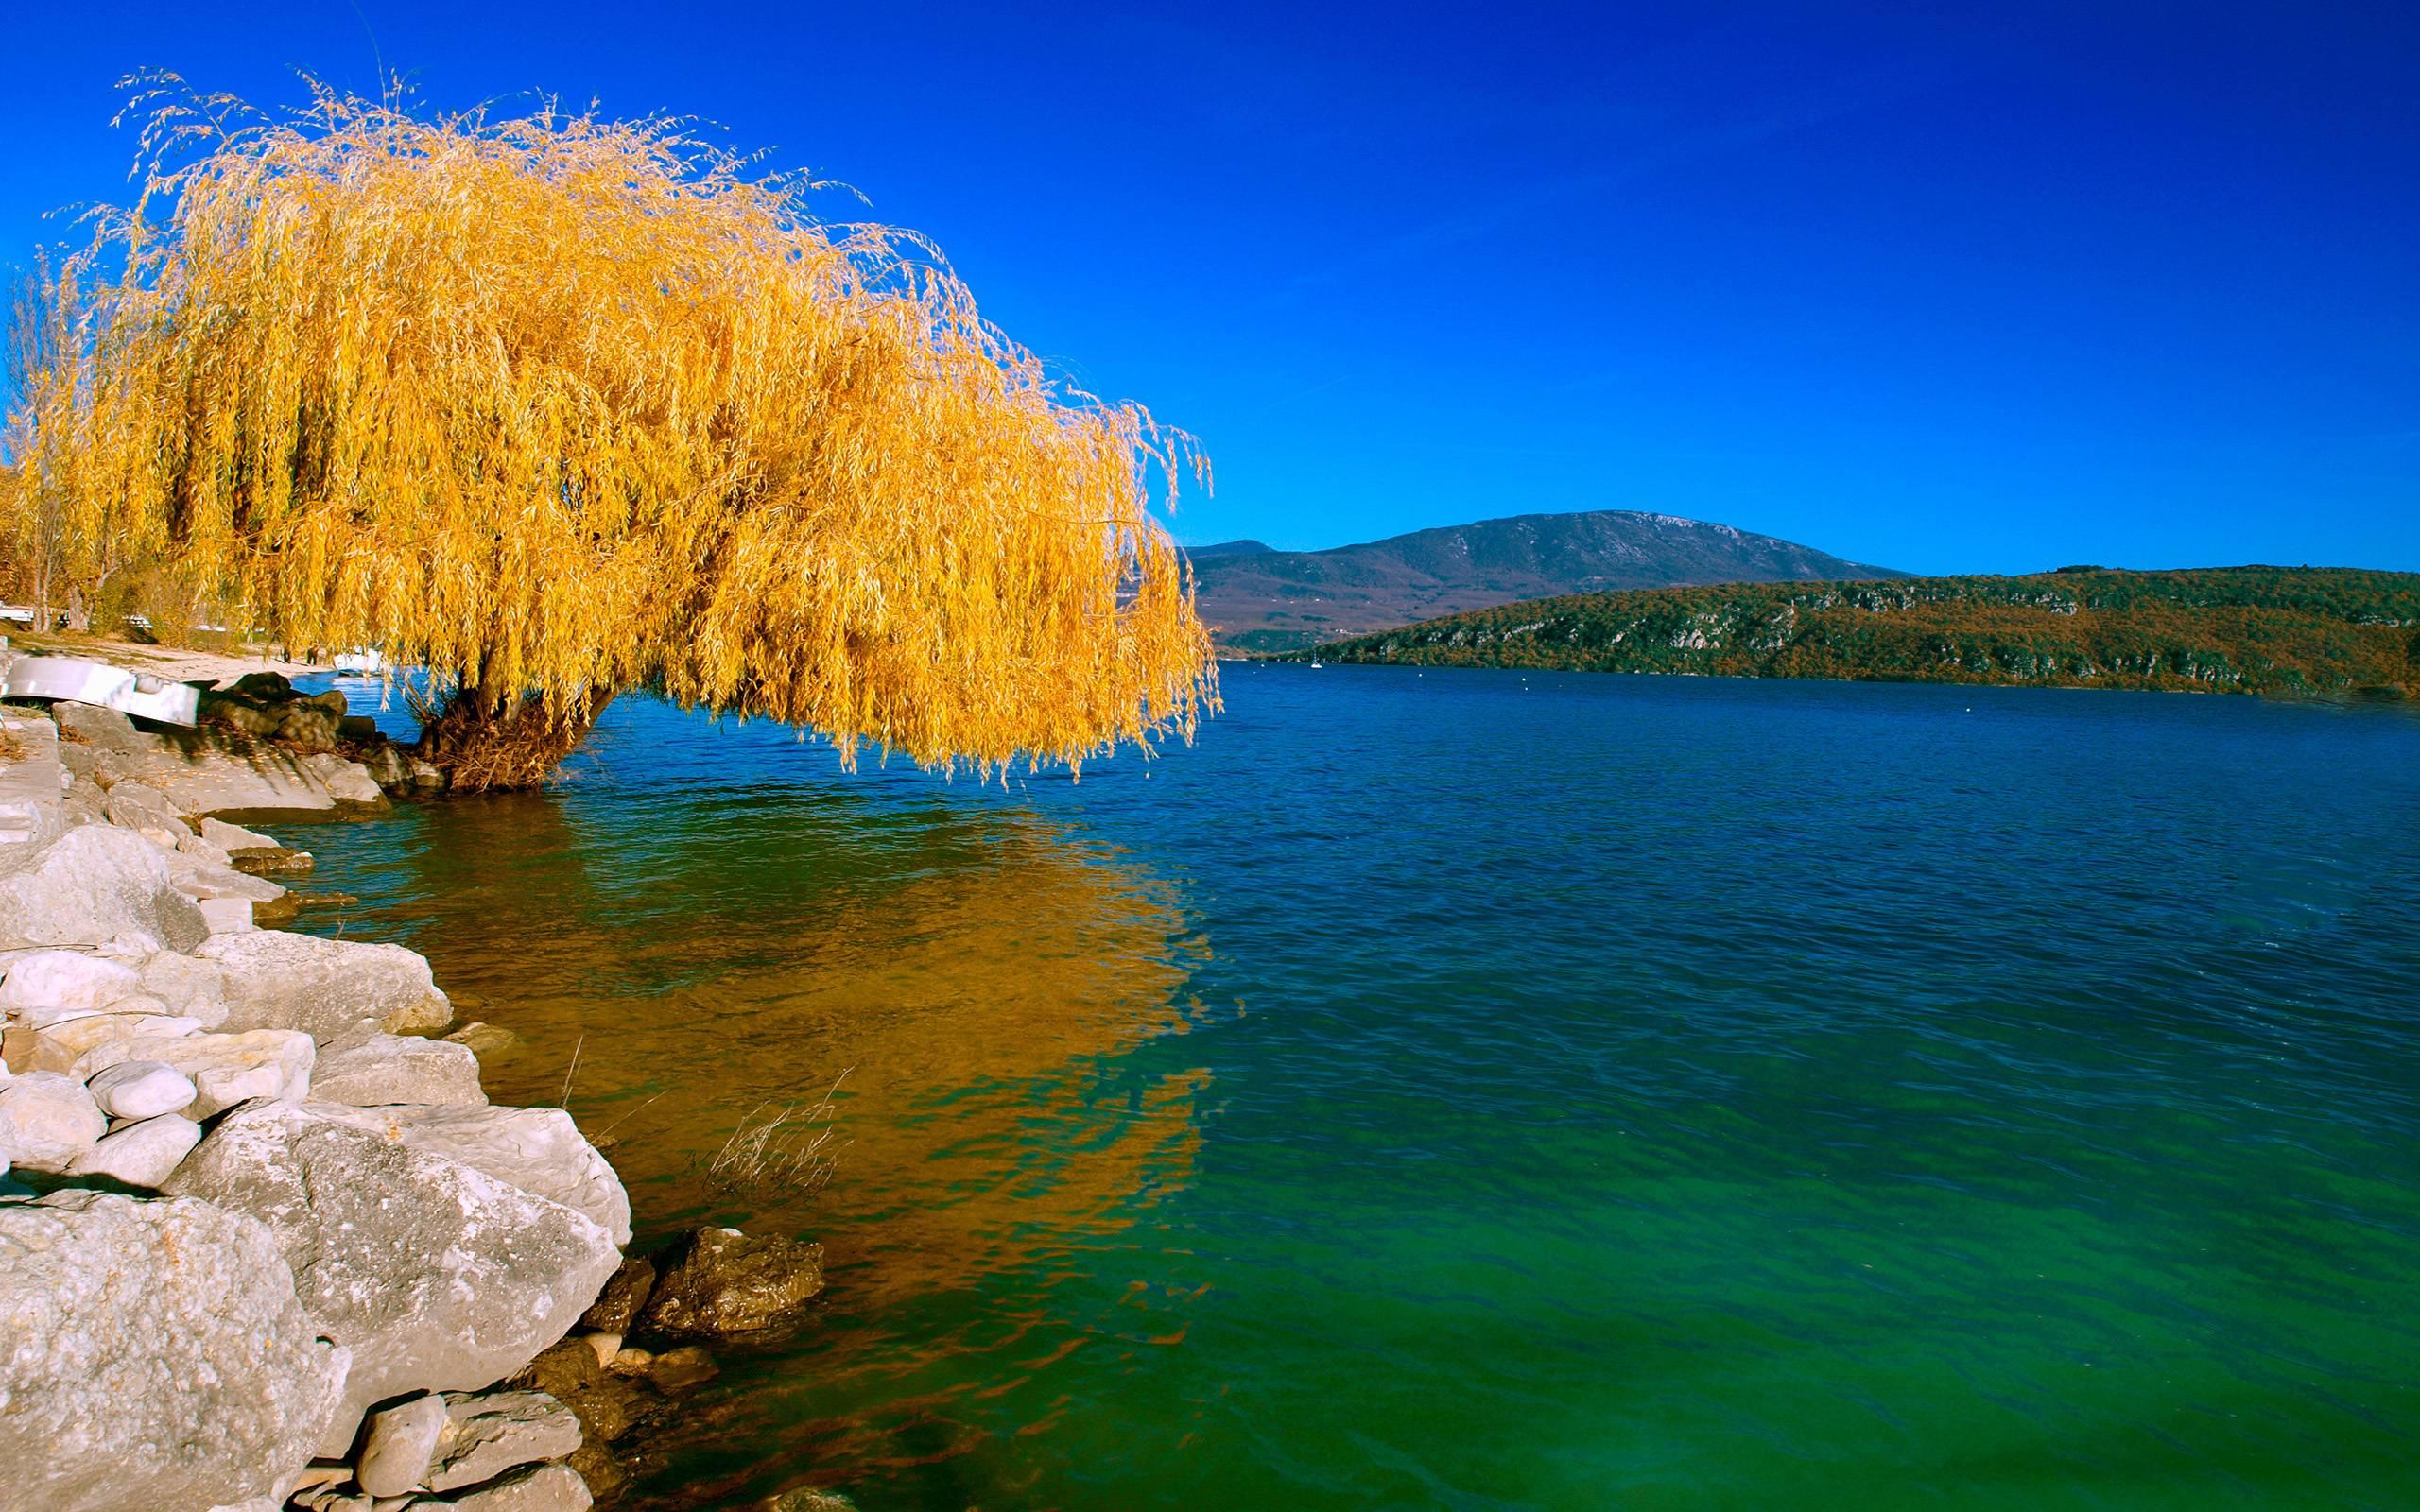 Nature Wallpaper Full Hd - Natural Scenery , HD Wallpaper & Backgrounds